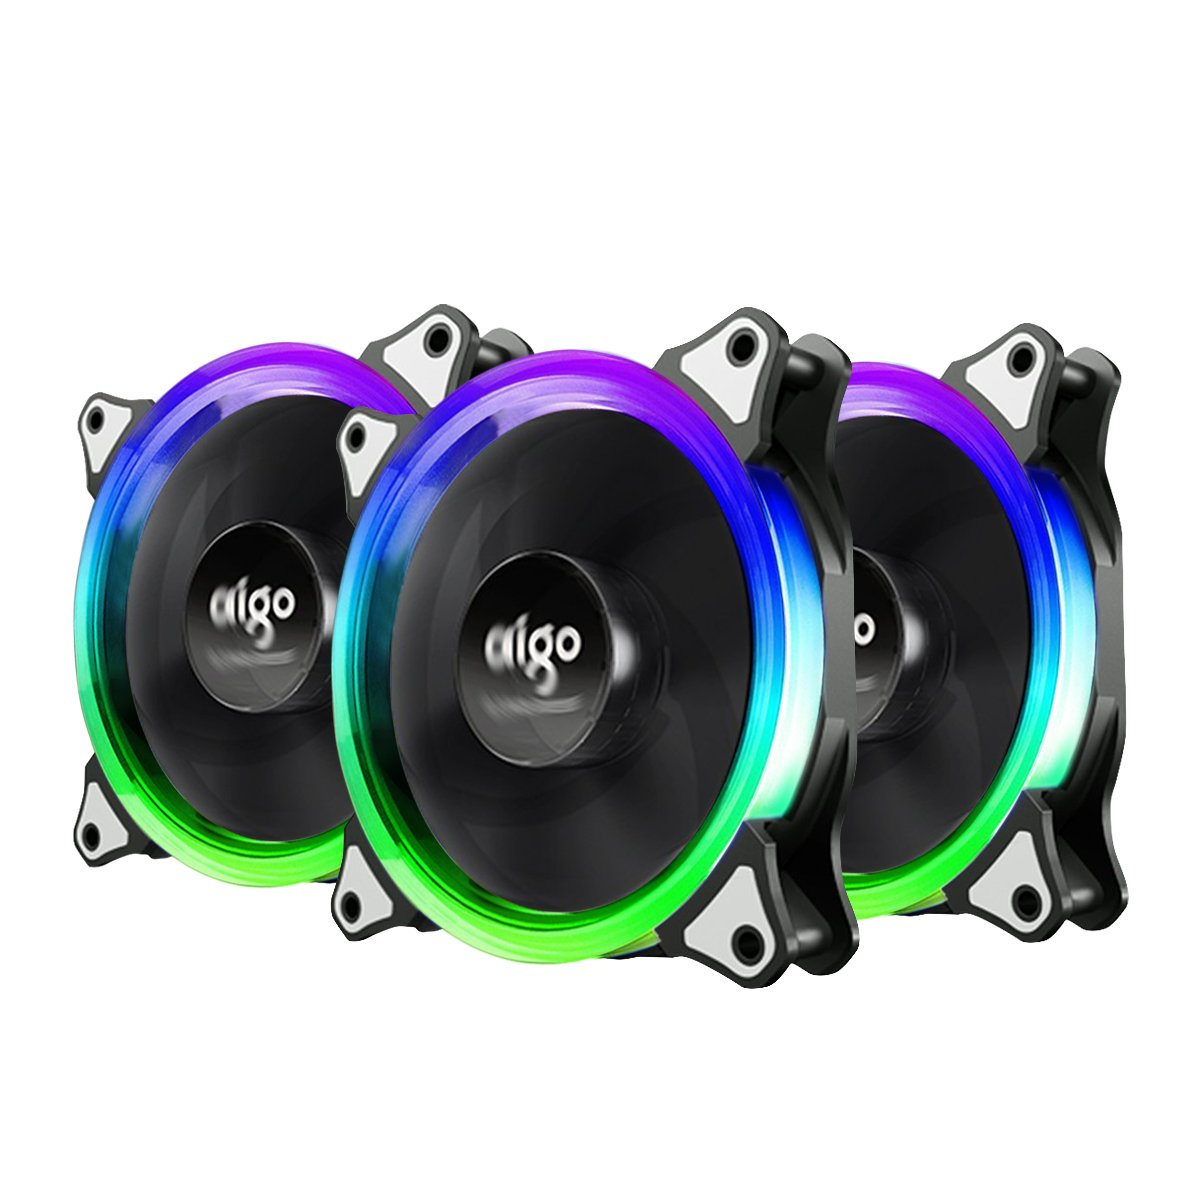 Case Fan, Aigo 3-Pack RGB LED 120mm High Airflow Quiet Edition Adjustable Color LED Fan CPU Coolers & Radiators for Computer Cases